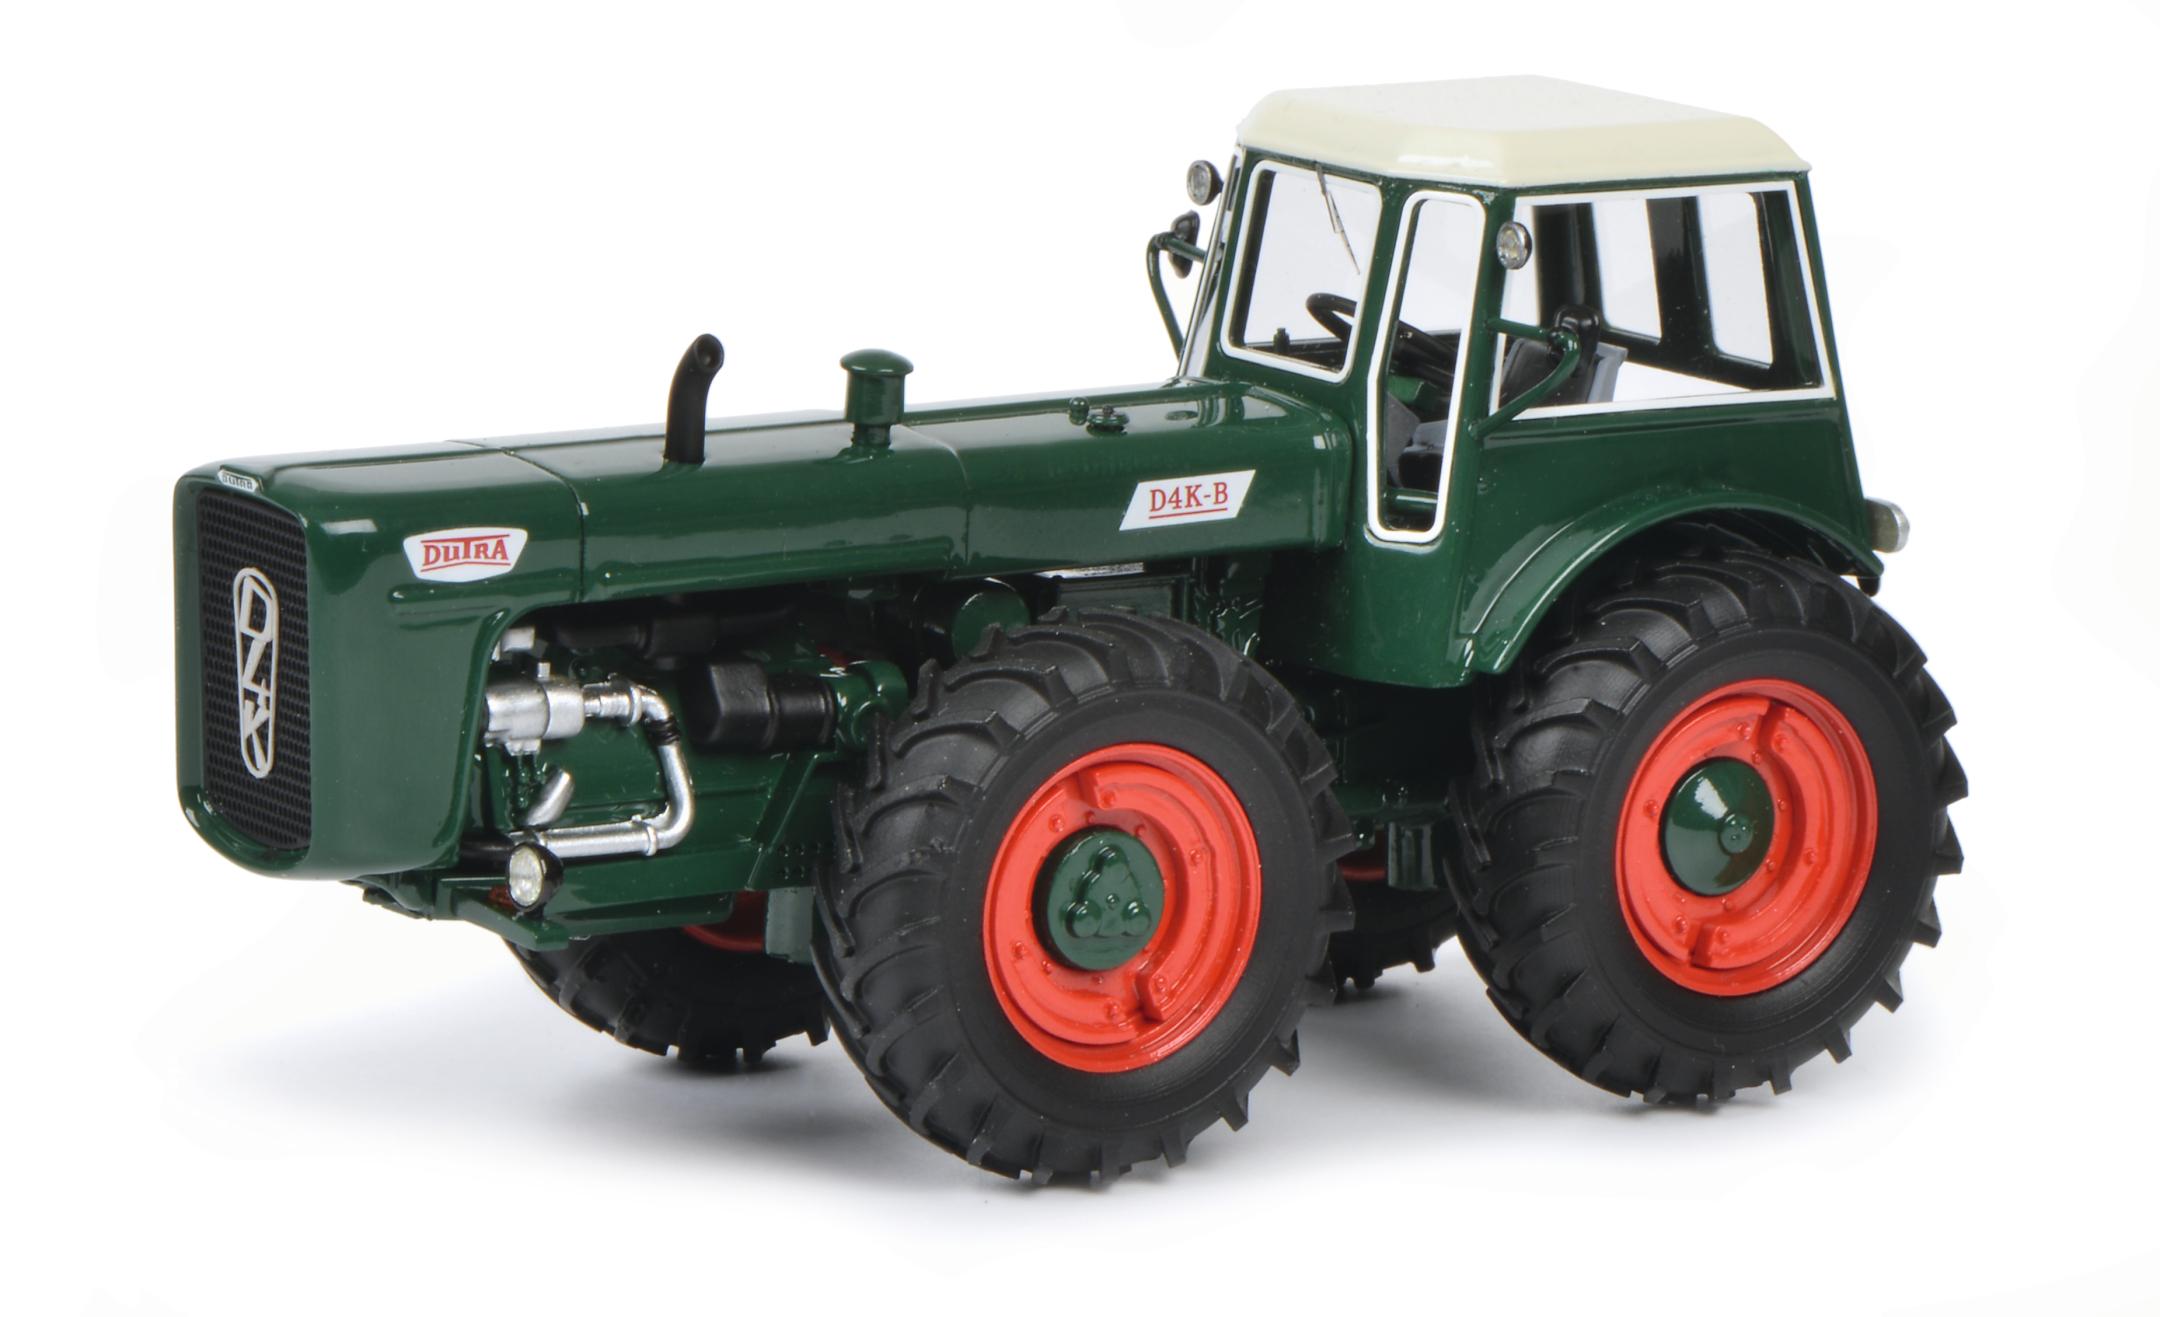 DUTRA D4K-B Traktor 1:43